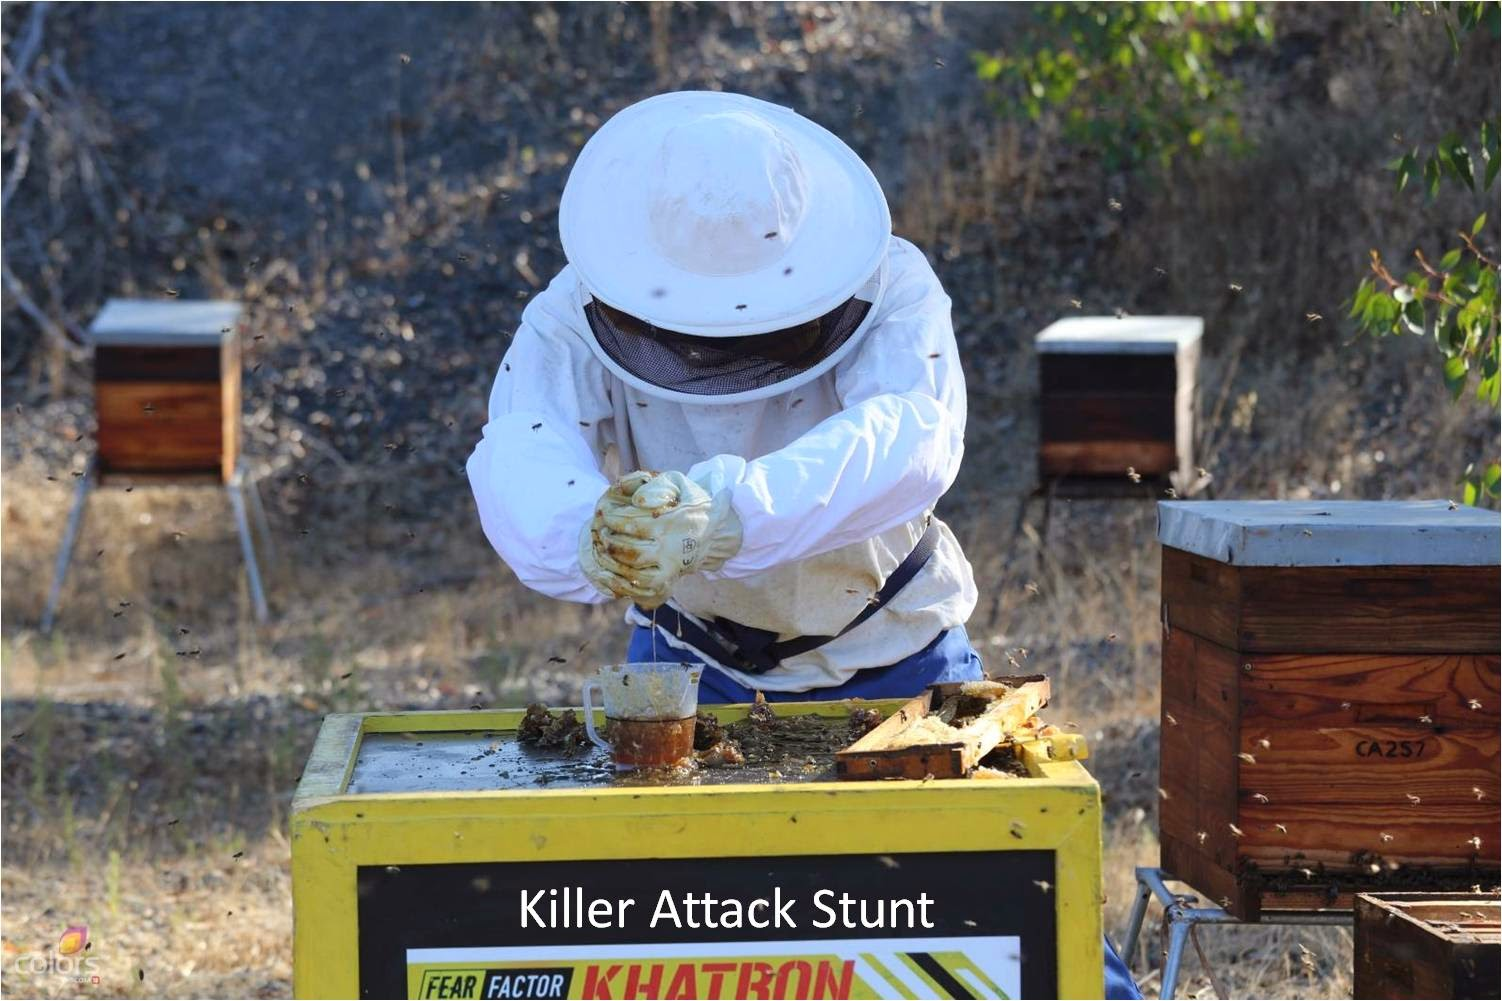 Khatron Ke Khiladi Dar Ka Blockbuster contestant with bees while squeezing honey in the stunt